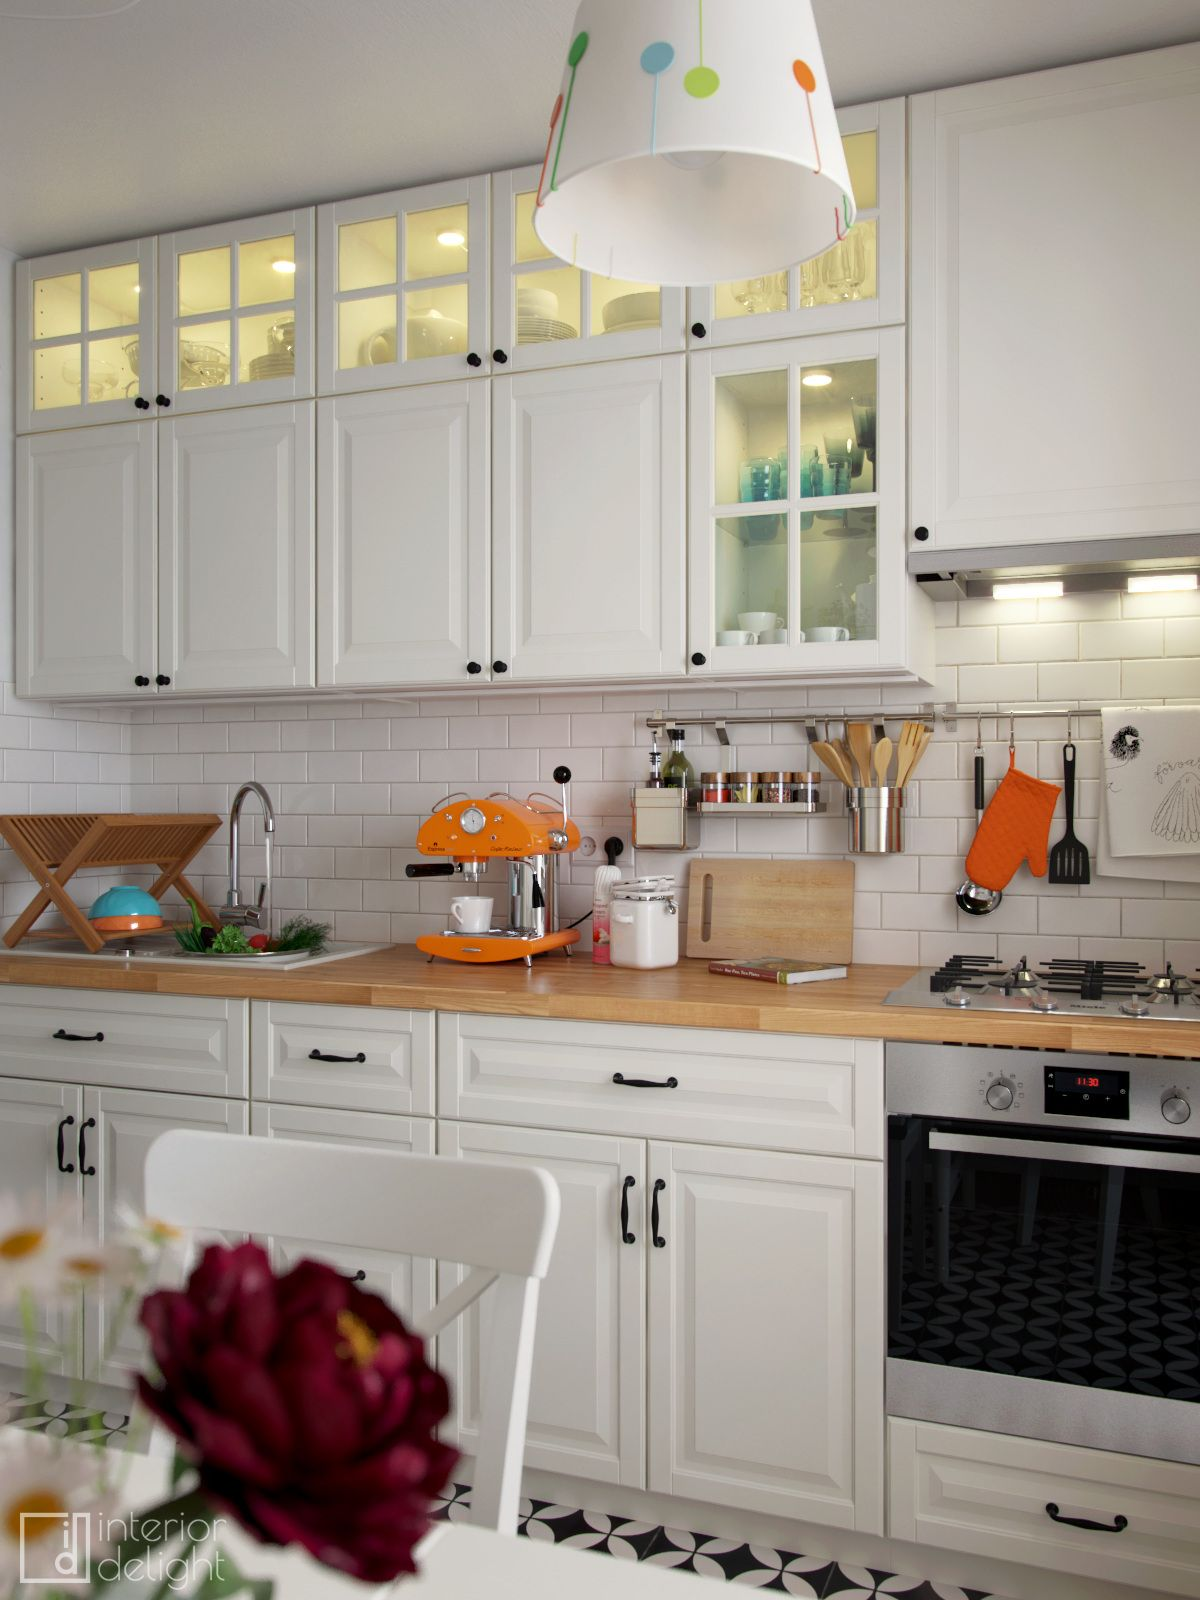 VrayWorld - Remodeling With Ikea | render | Pinterest | Küchen ...